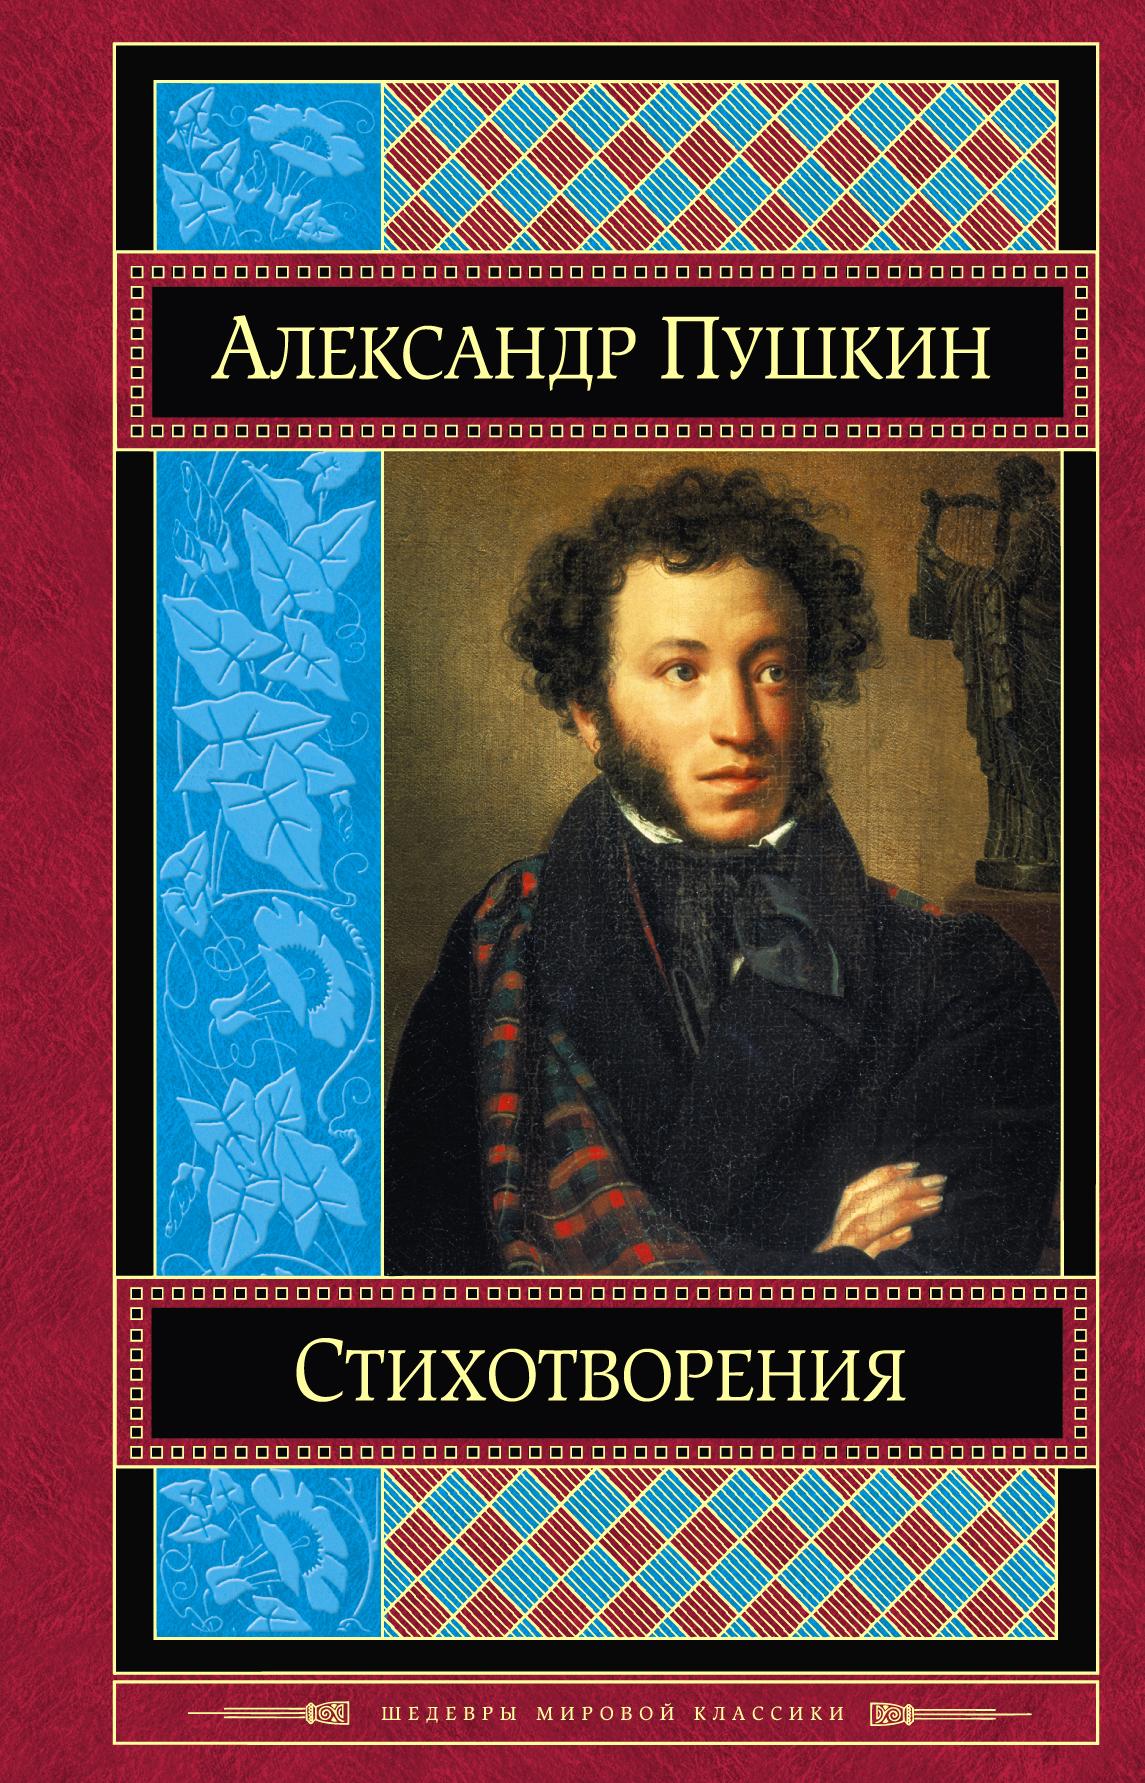 Александр Пушкин. Стихотворения